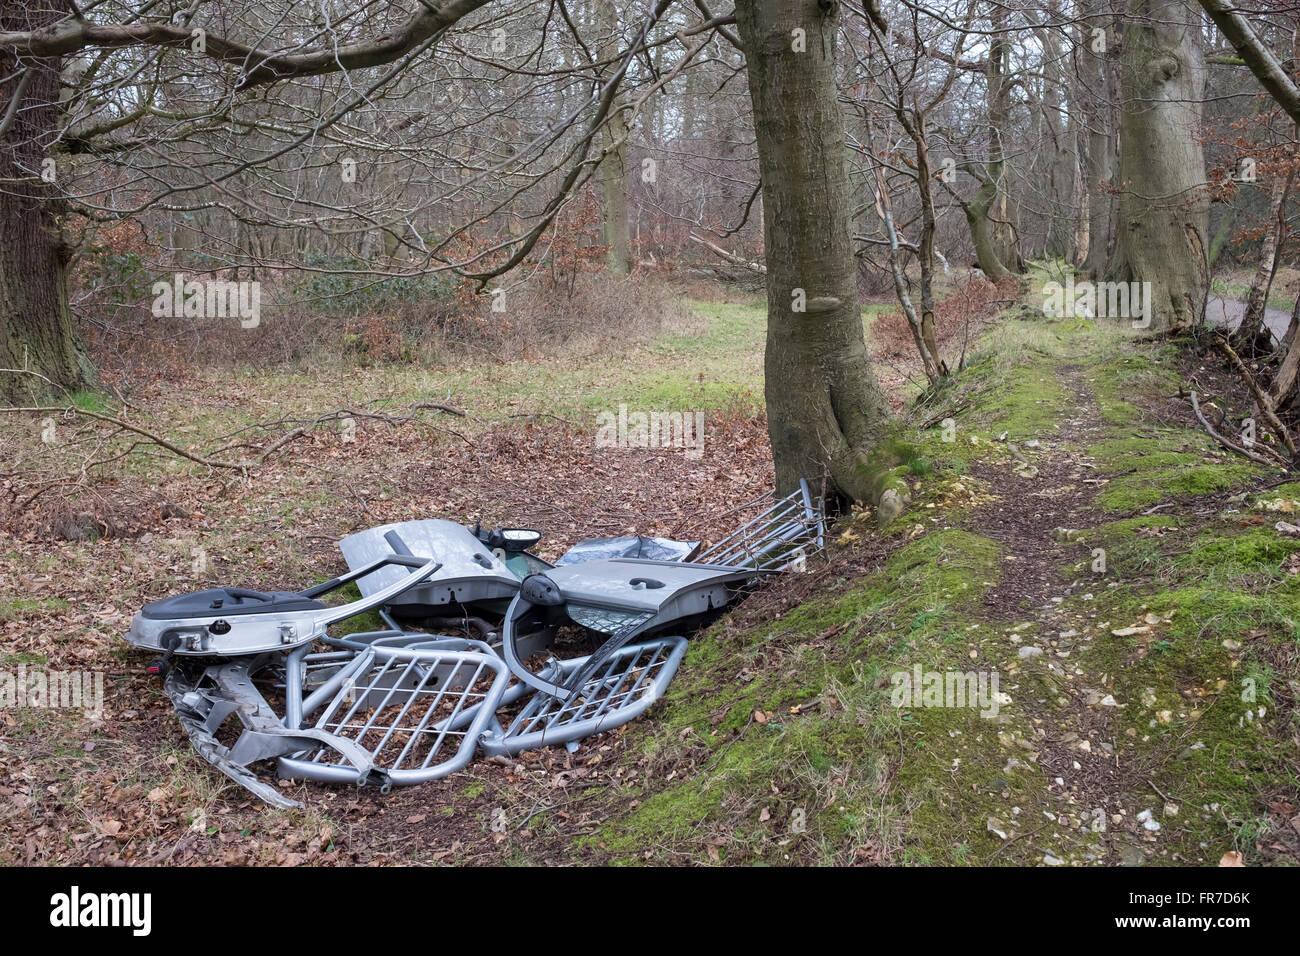 Fly Tipping Rubbish dumped in Ashridge Forest, Hertfordshire mail@davidlevenson.com - Stock Image